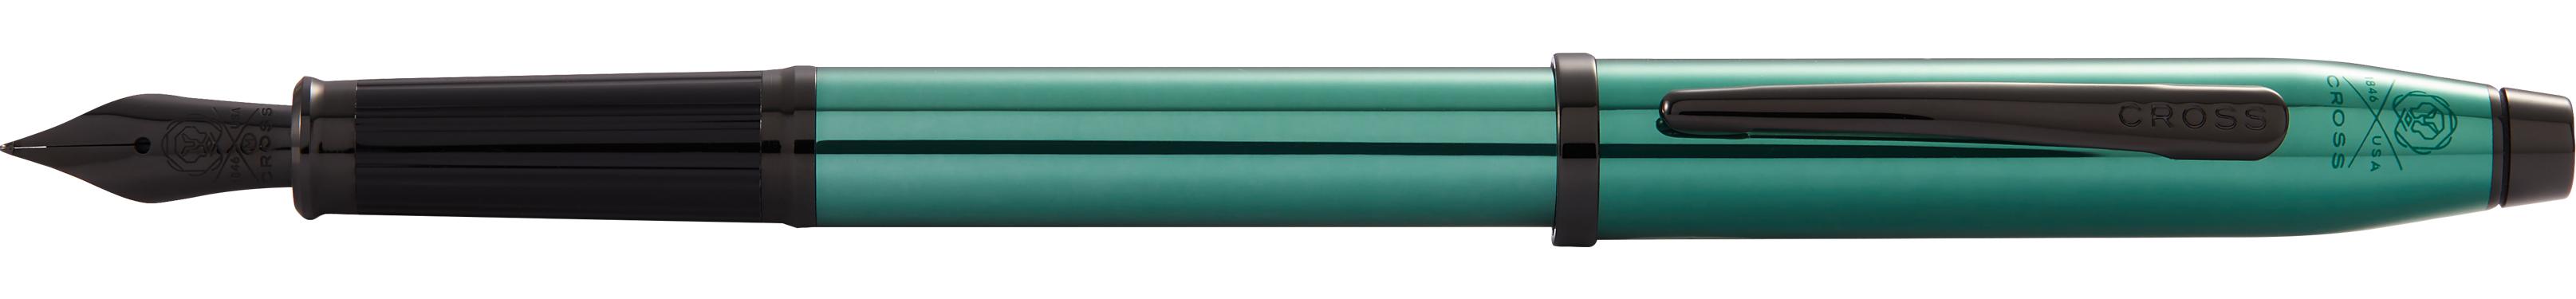 Century II Translucent Green Lacquer Fountain Pen